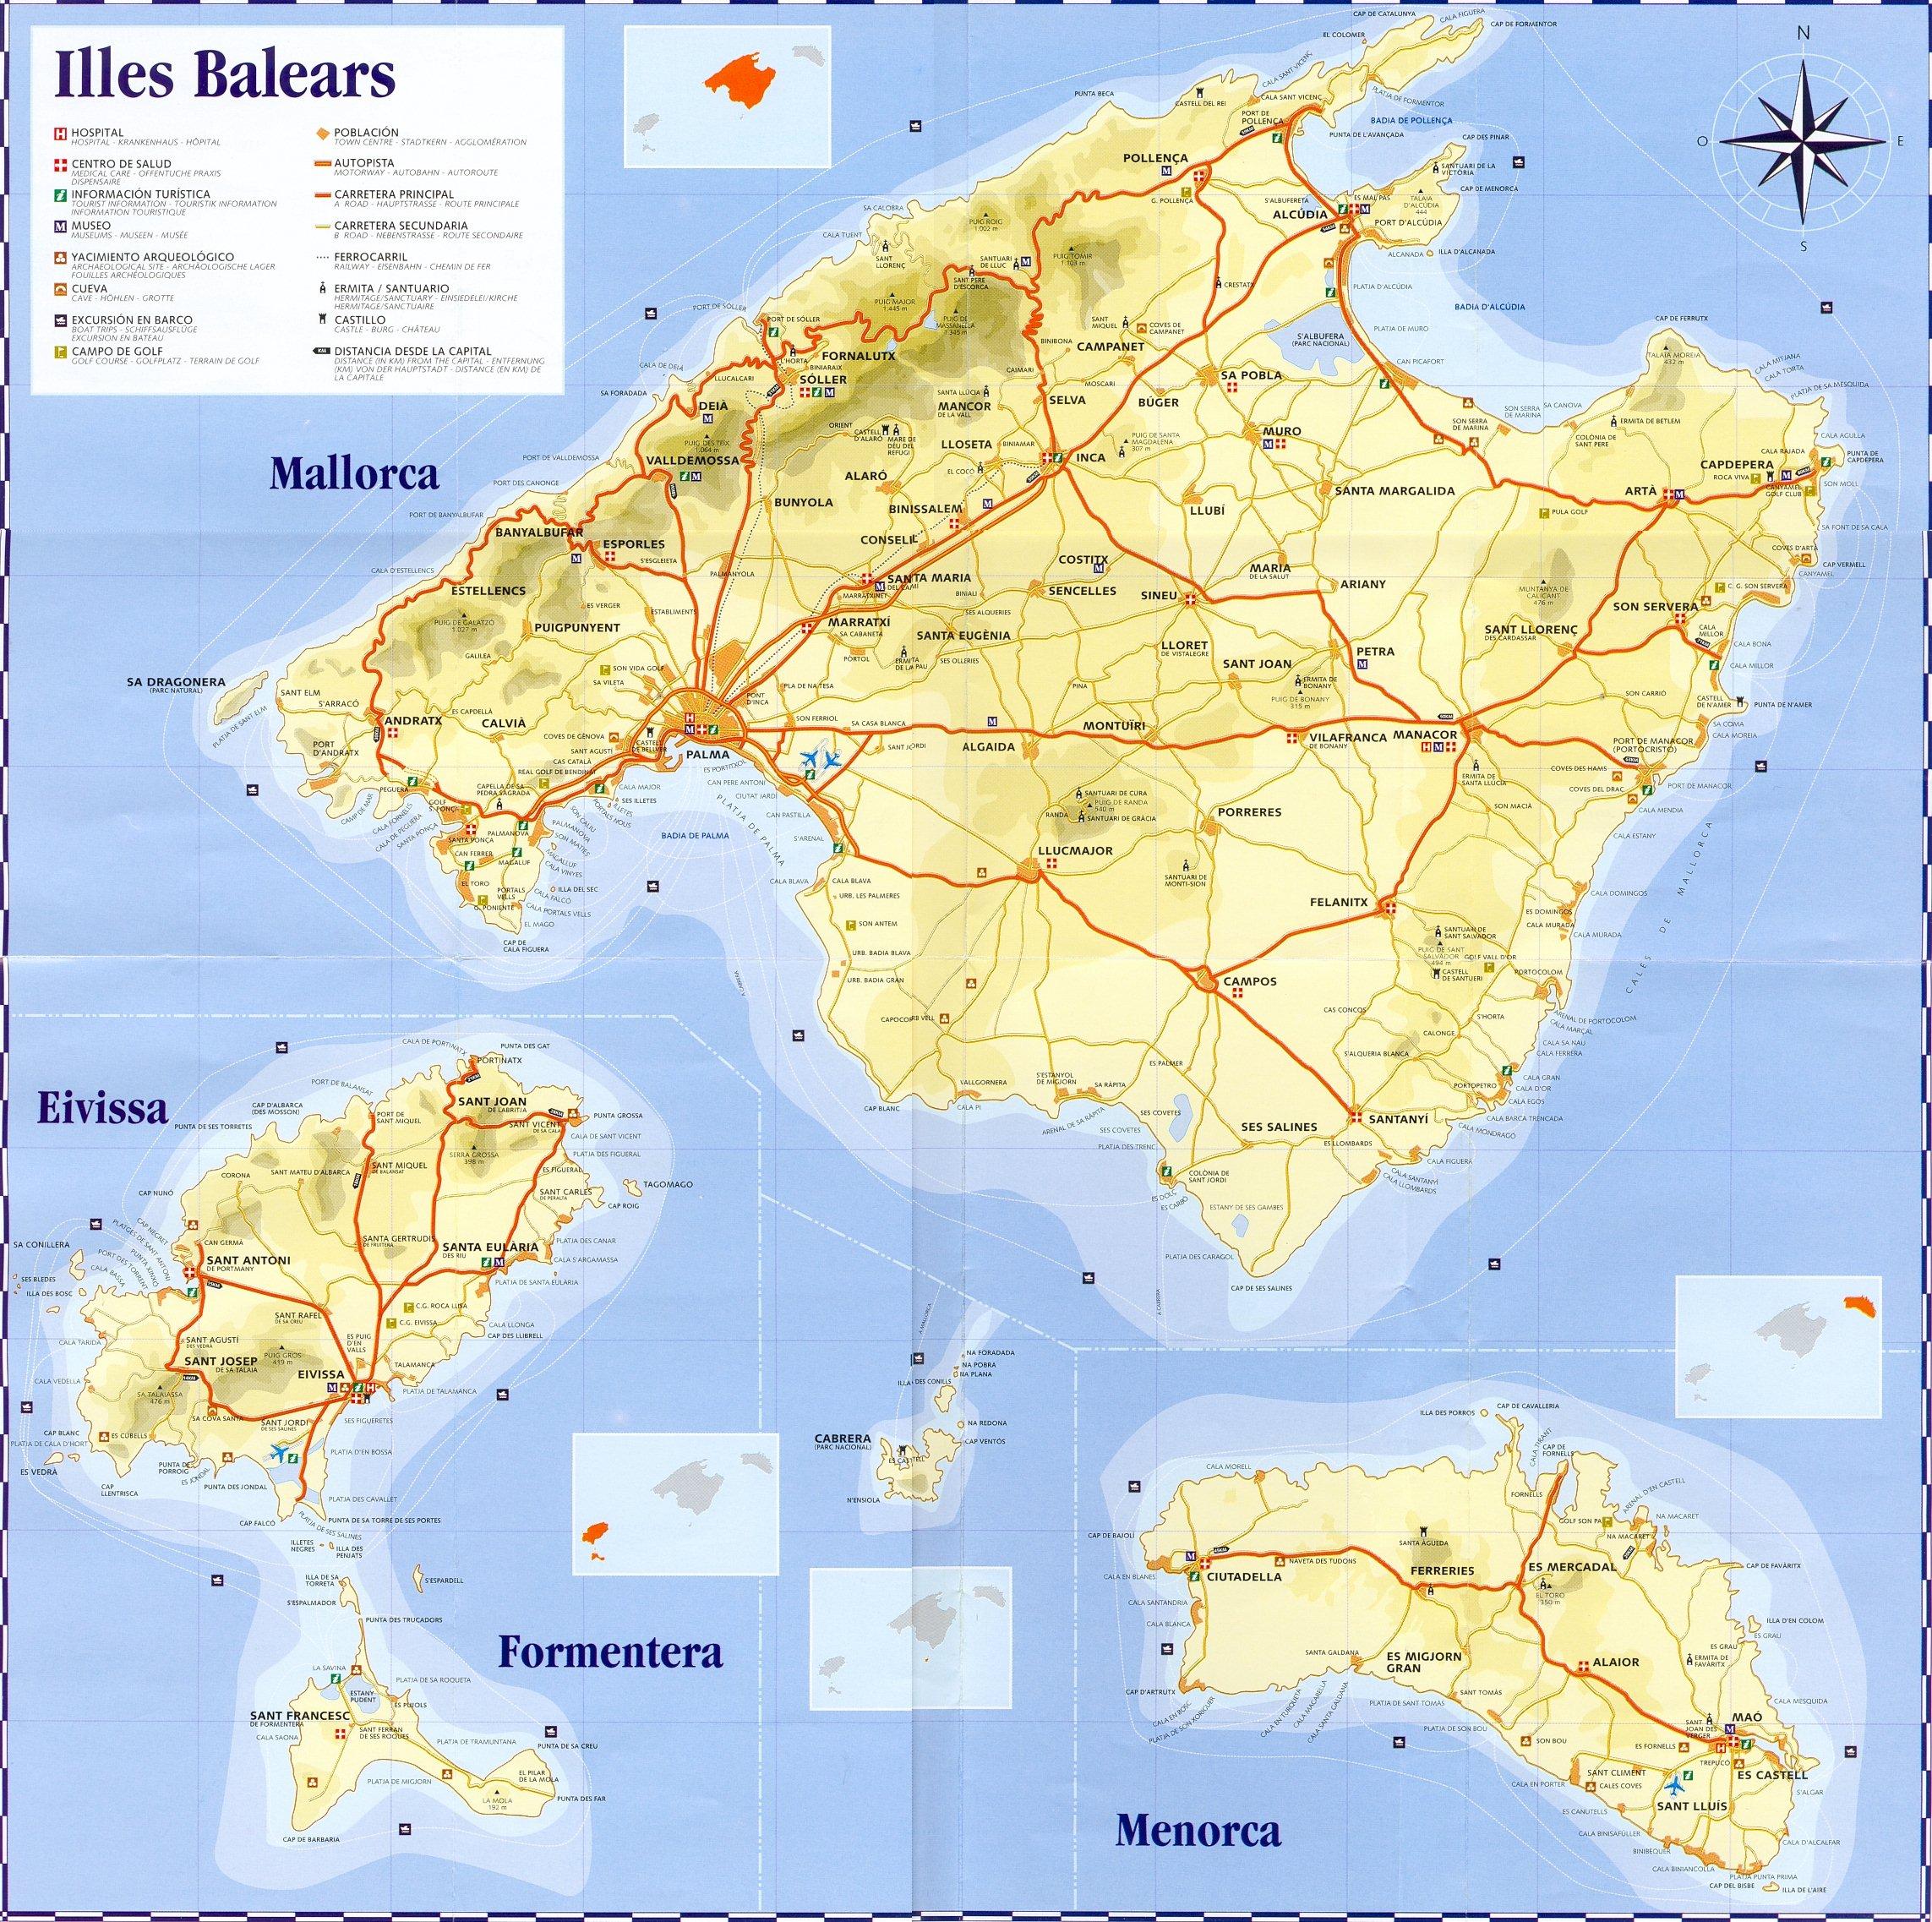 Mapa Islas Baleares, España